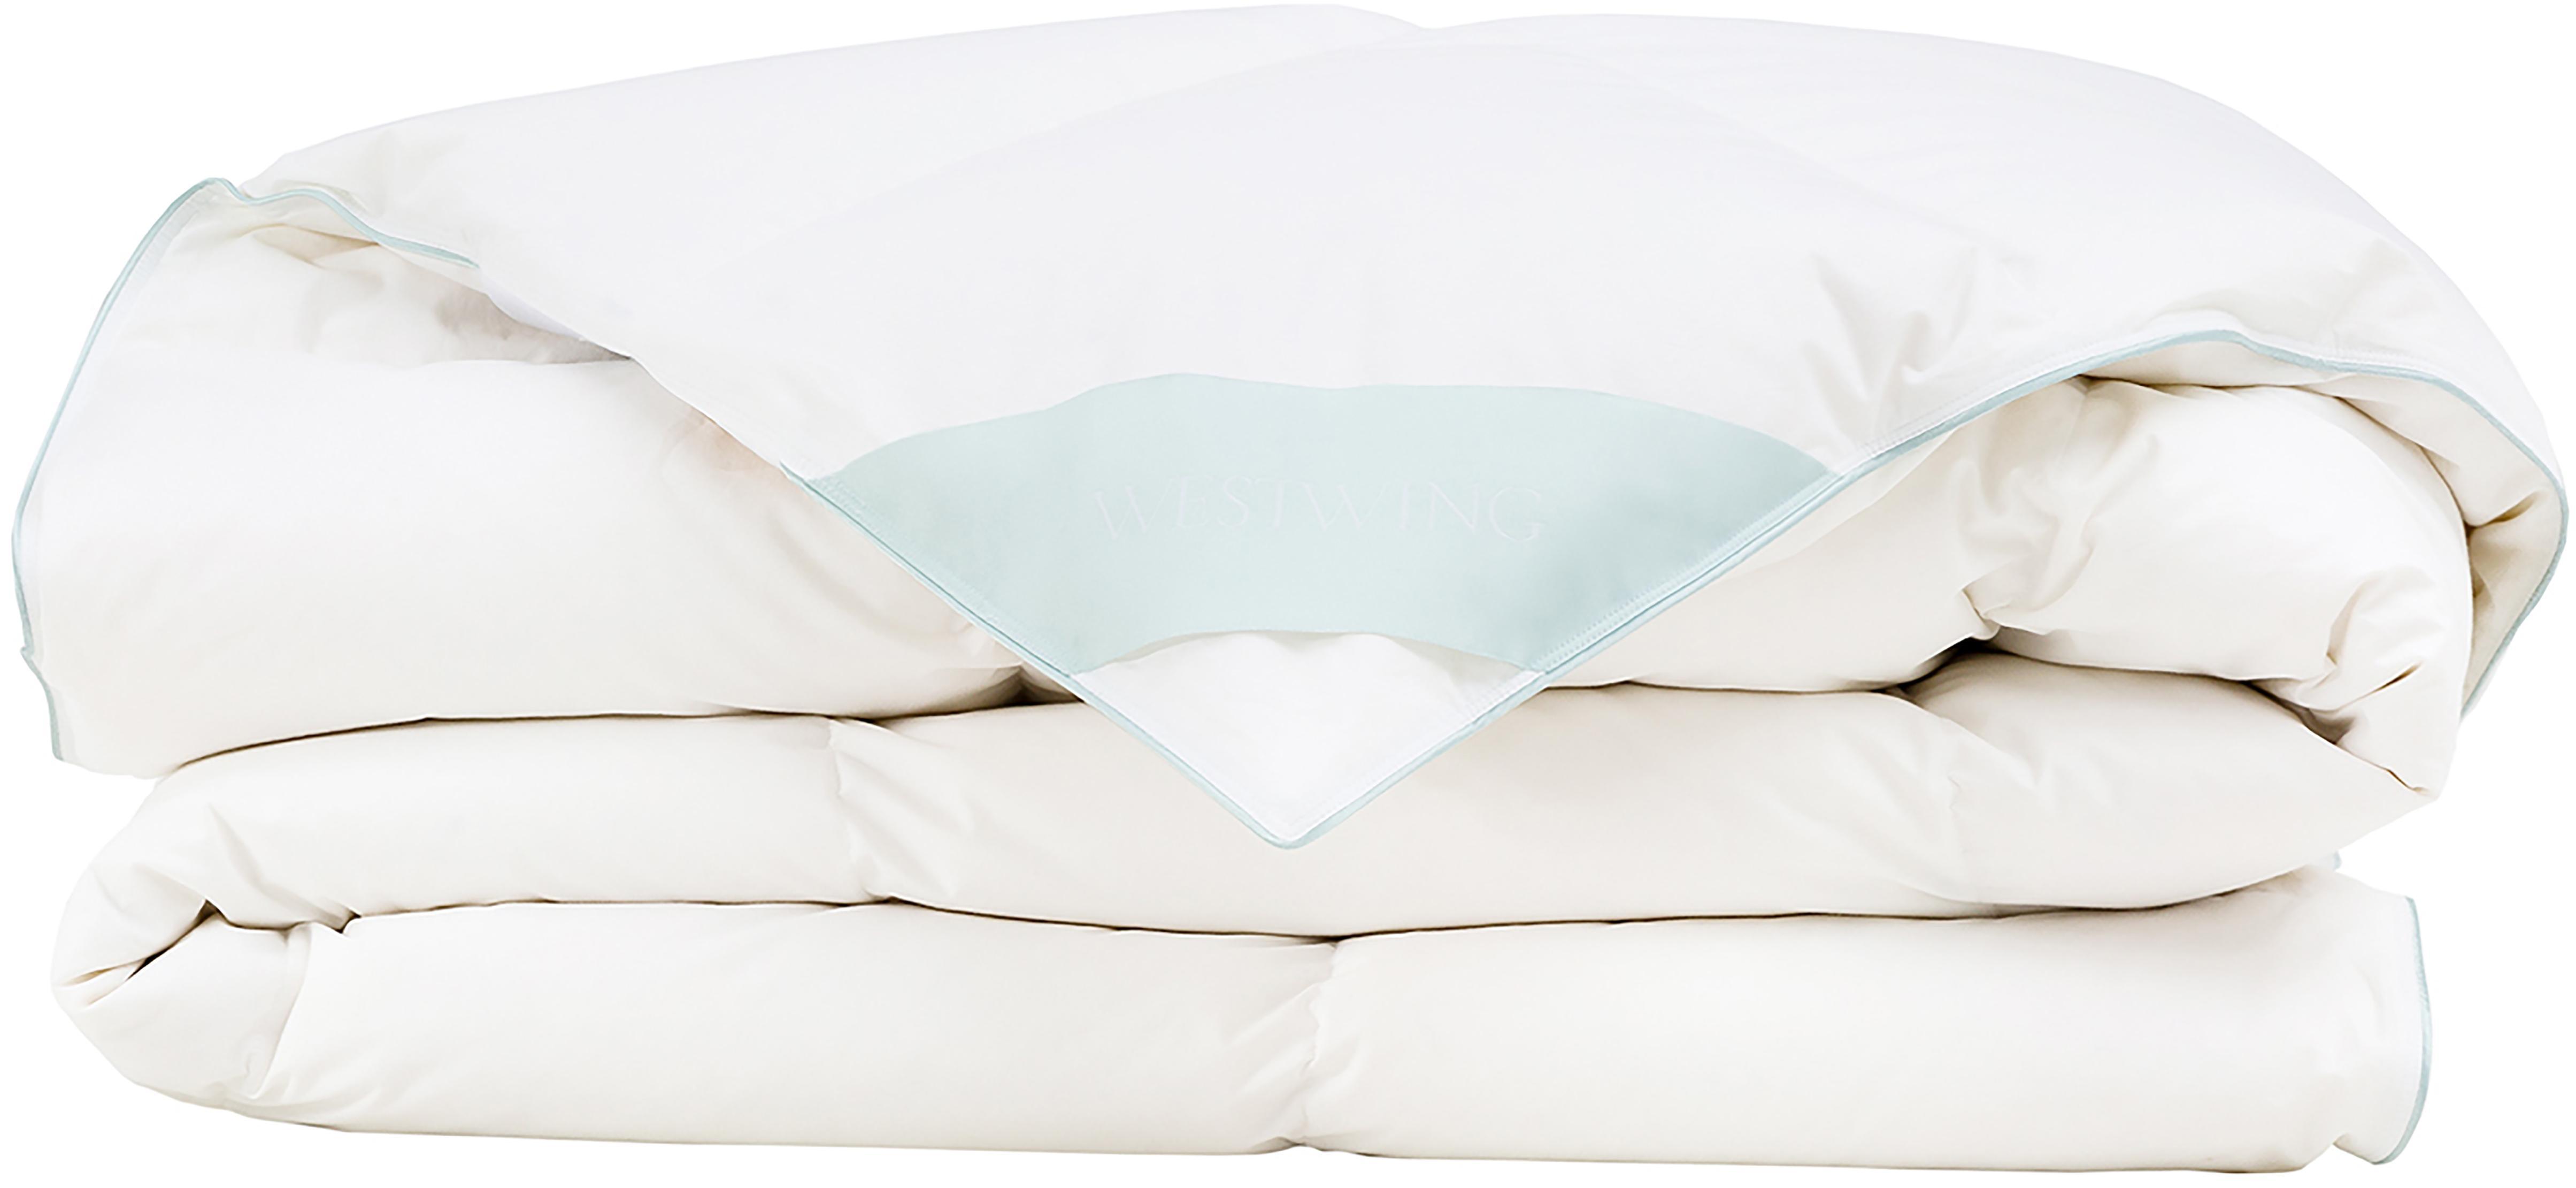 Daunen-Bettdecke Comfort, mittel, Hülle: 100% Baumwolle, feine Mak, Weiß, 200 x 200 cm